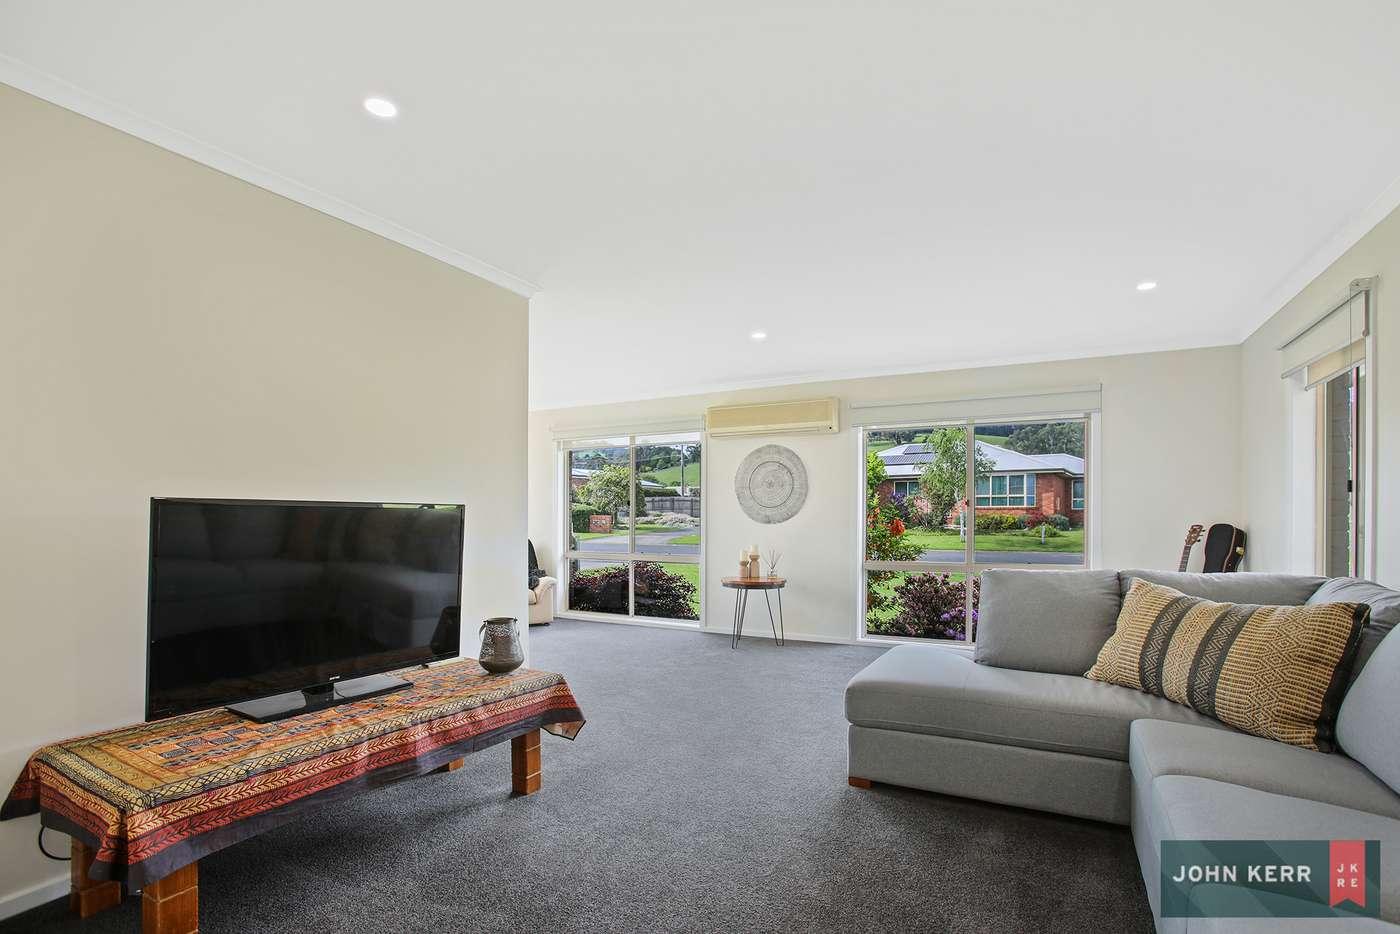 Sixth view of Homely house listing, 15 Centenary Drive, Trafalgar VIC 3824